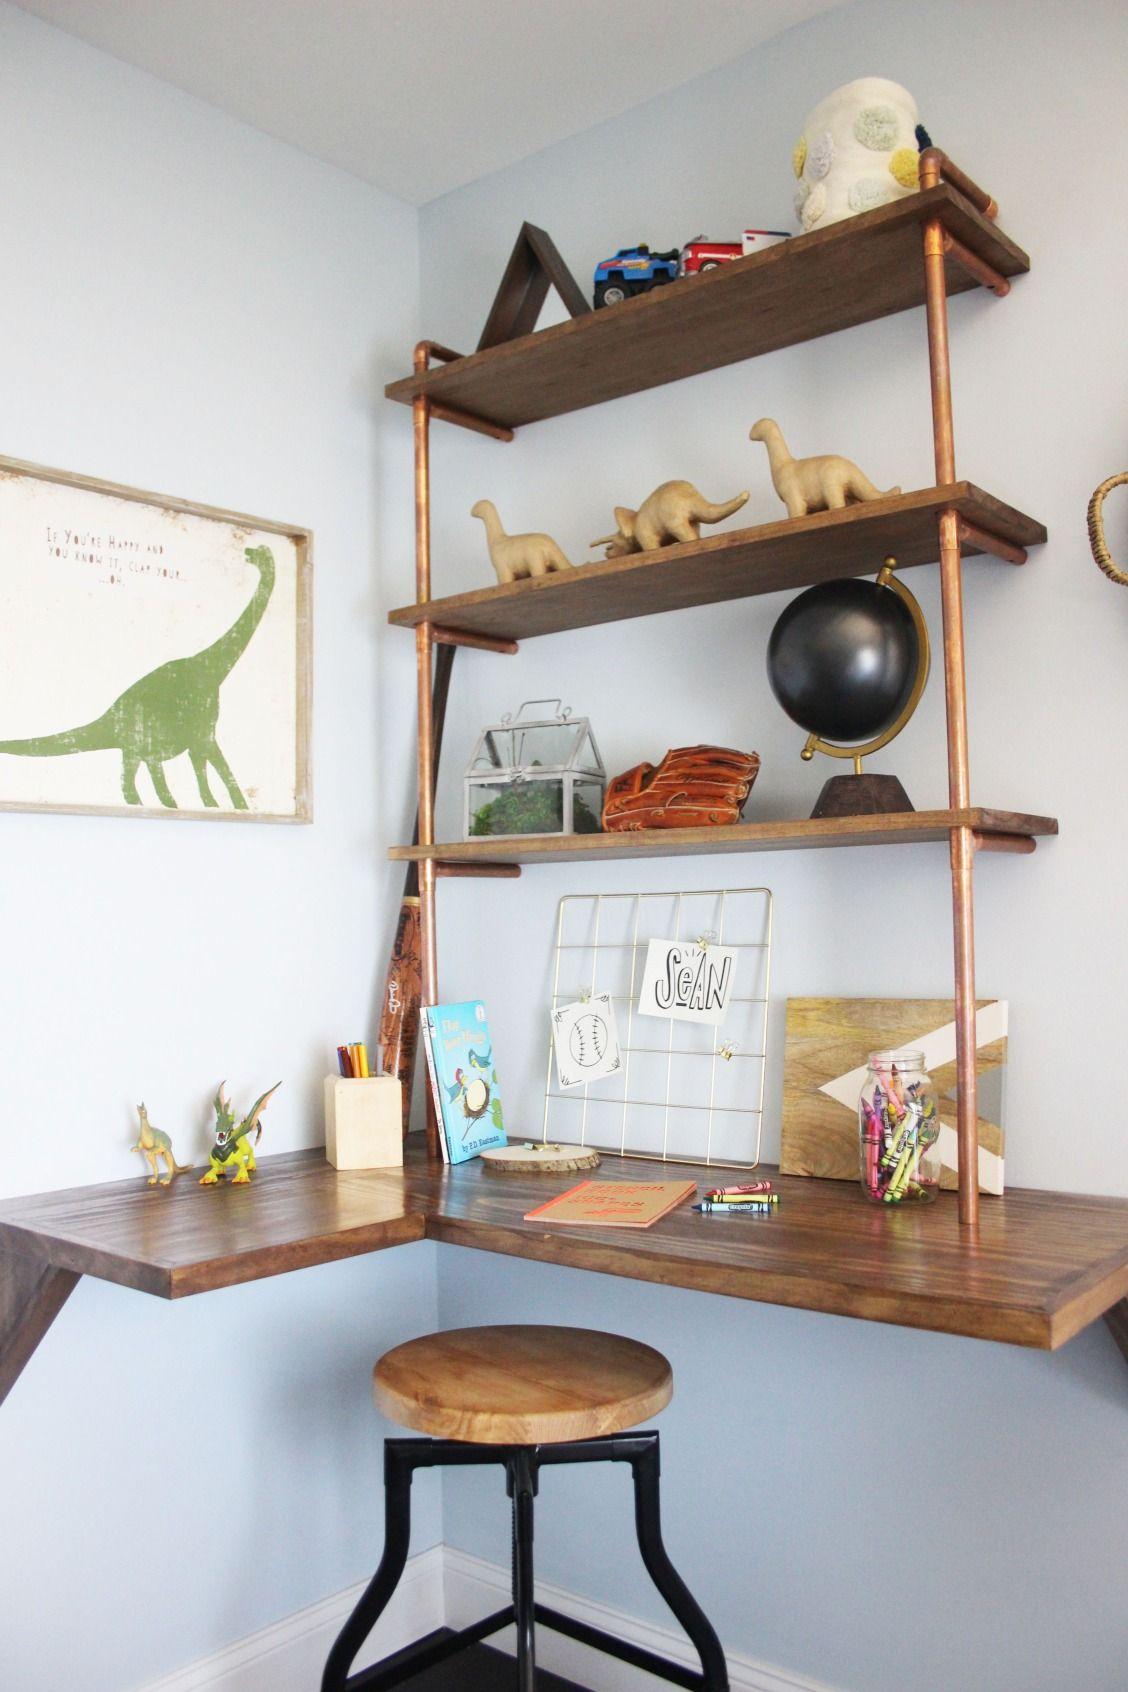 Diy Projects And Ideas Diy Corner Desk Floating Shelves